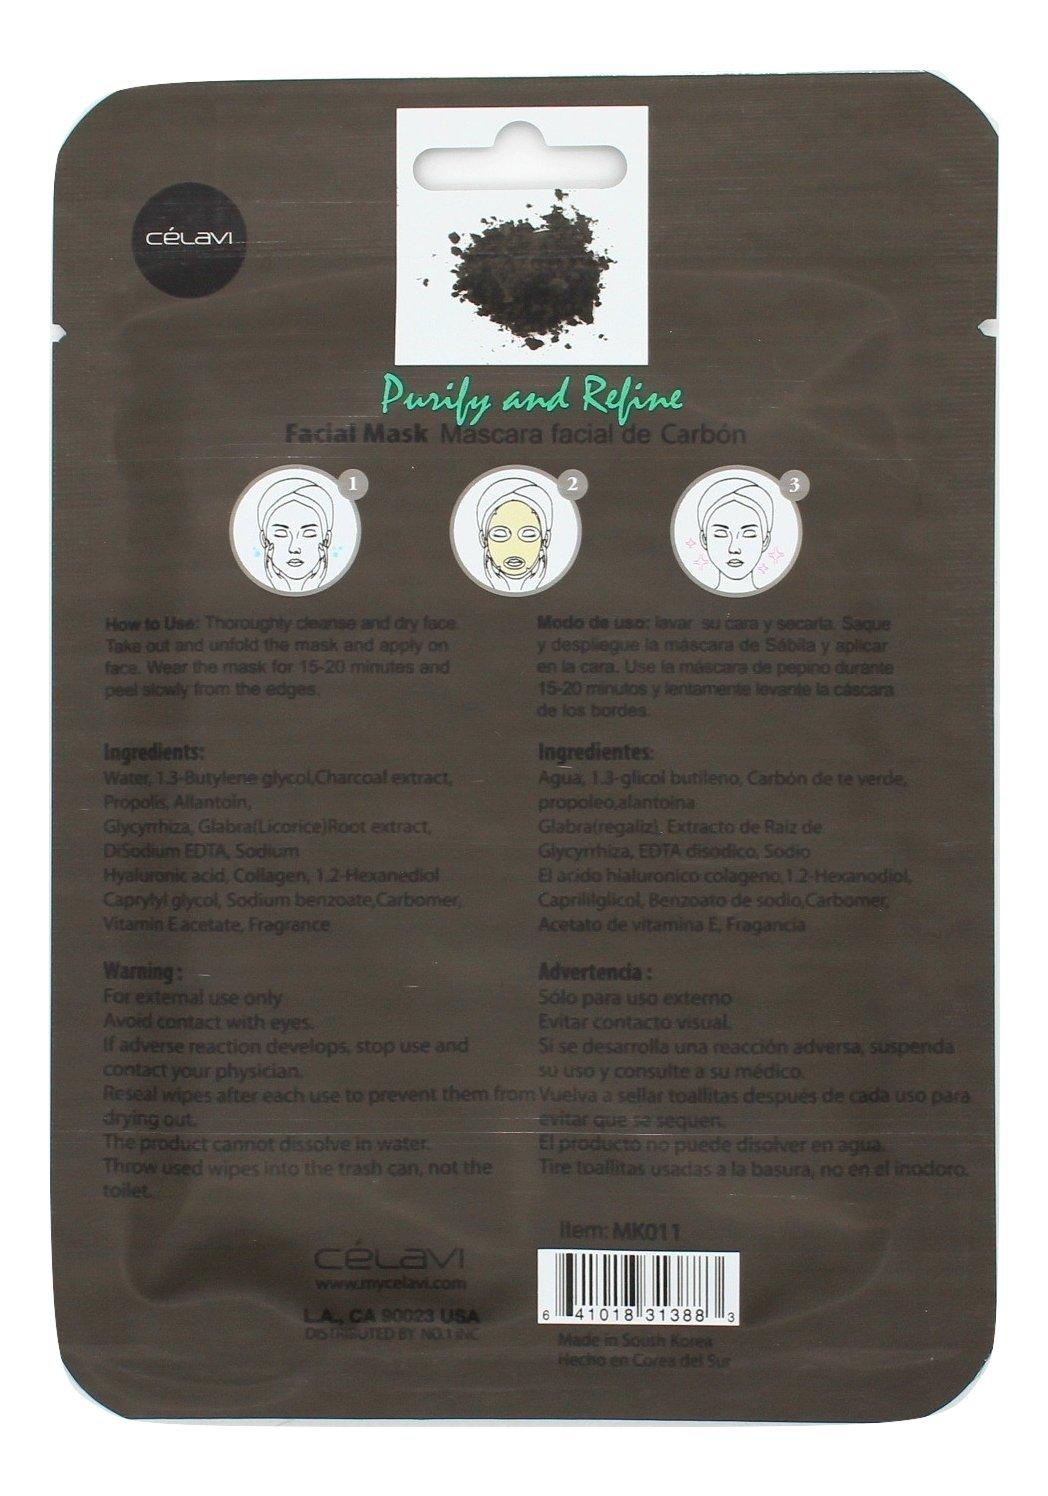 Amazon.com : Celavi Essence Facial Mask Paper Sheet Korea Skin Care Moisturizing 24 Pack (Charcoal) : Beauty